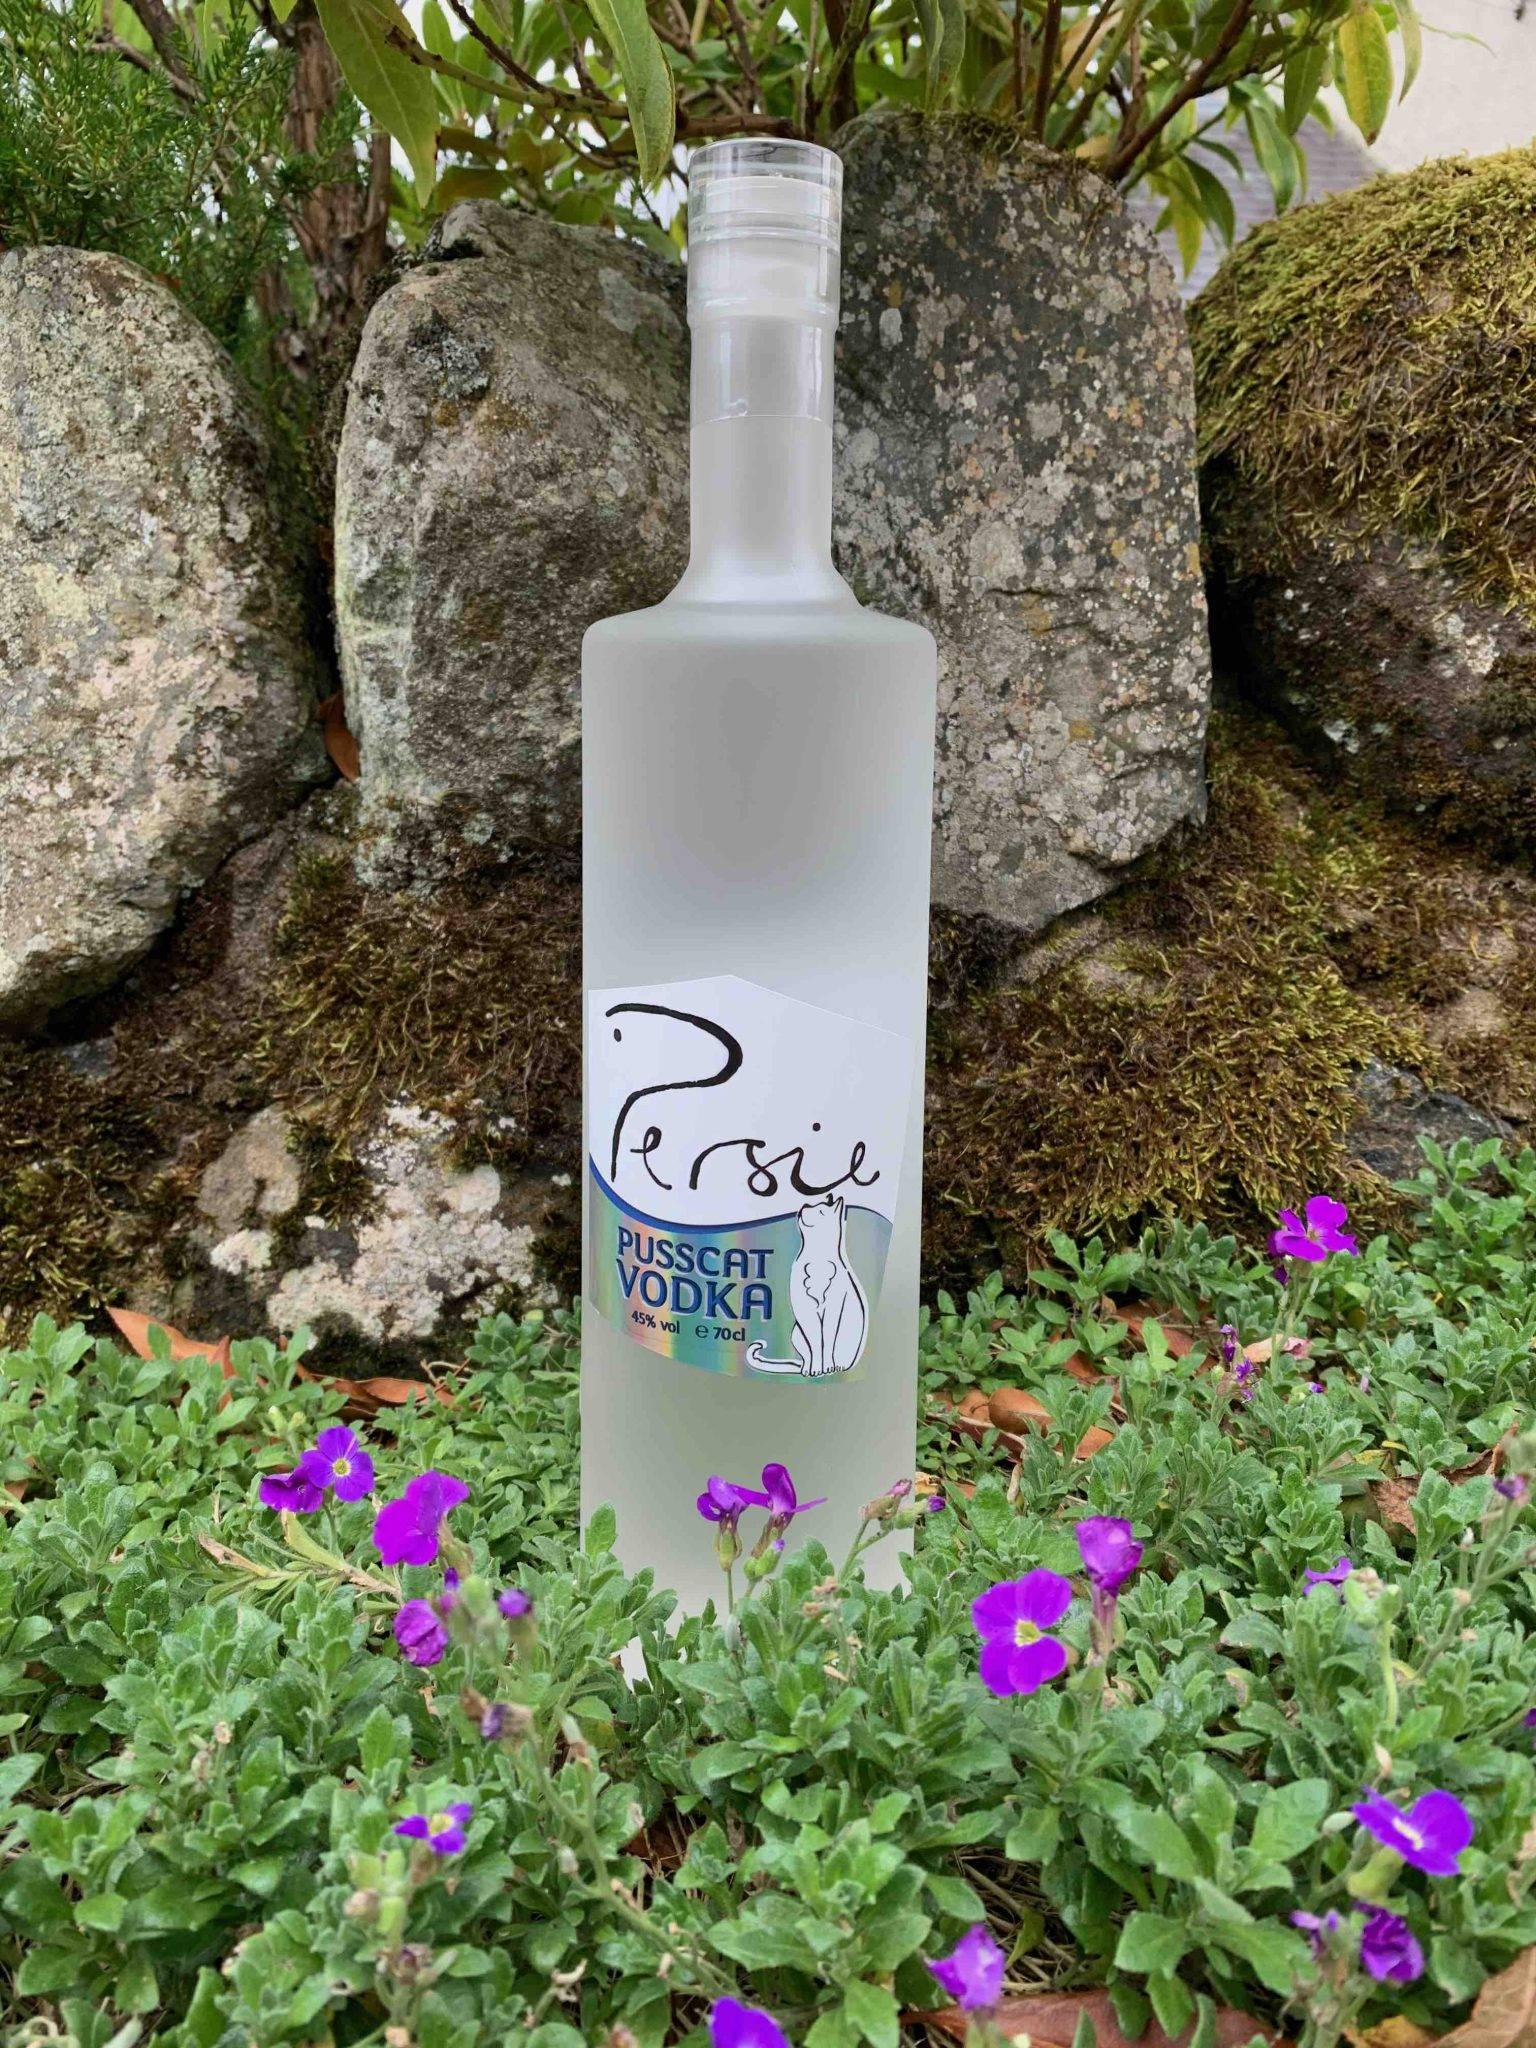 Persie Pusscat Vodka